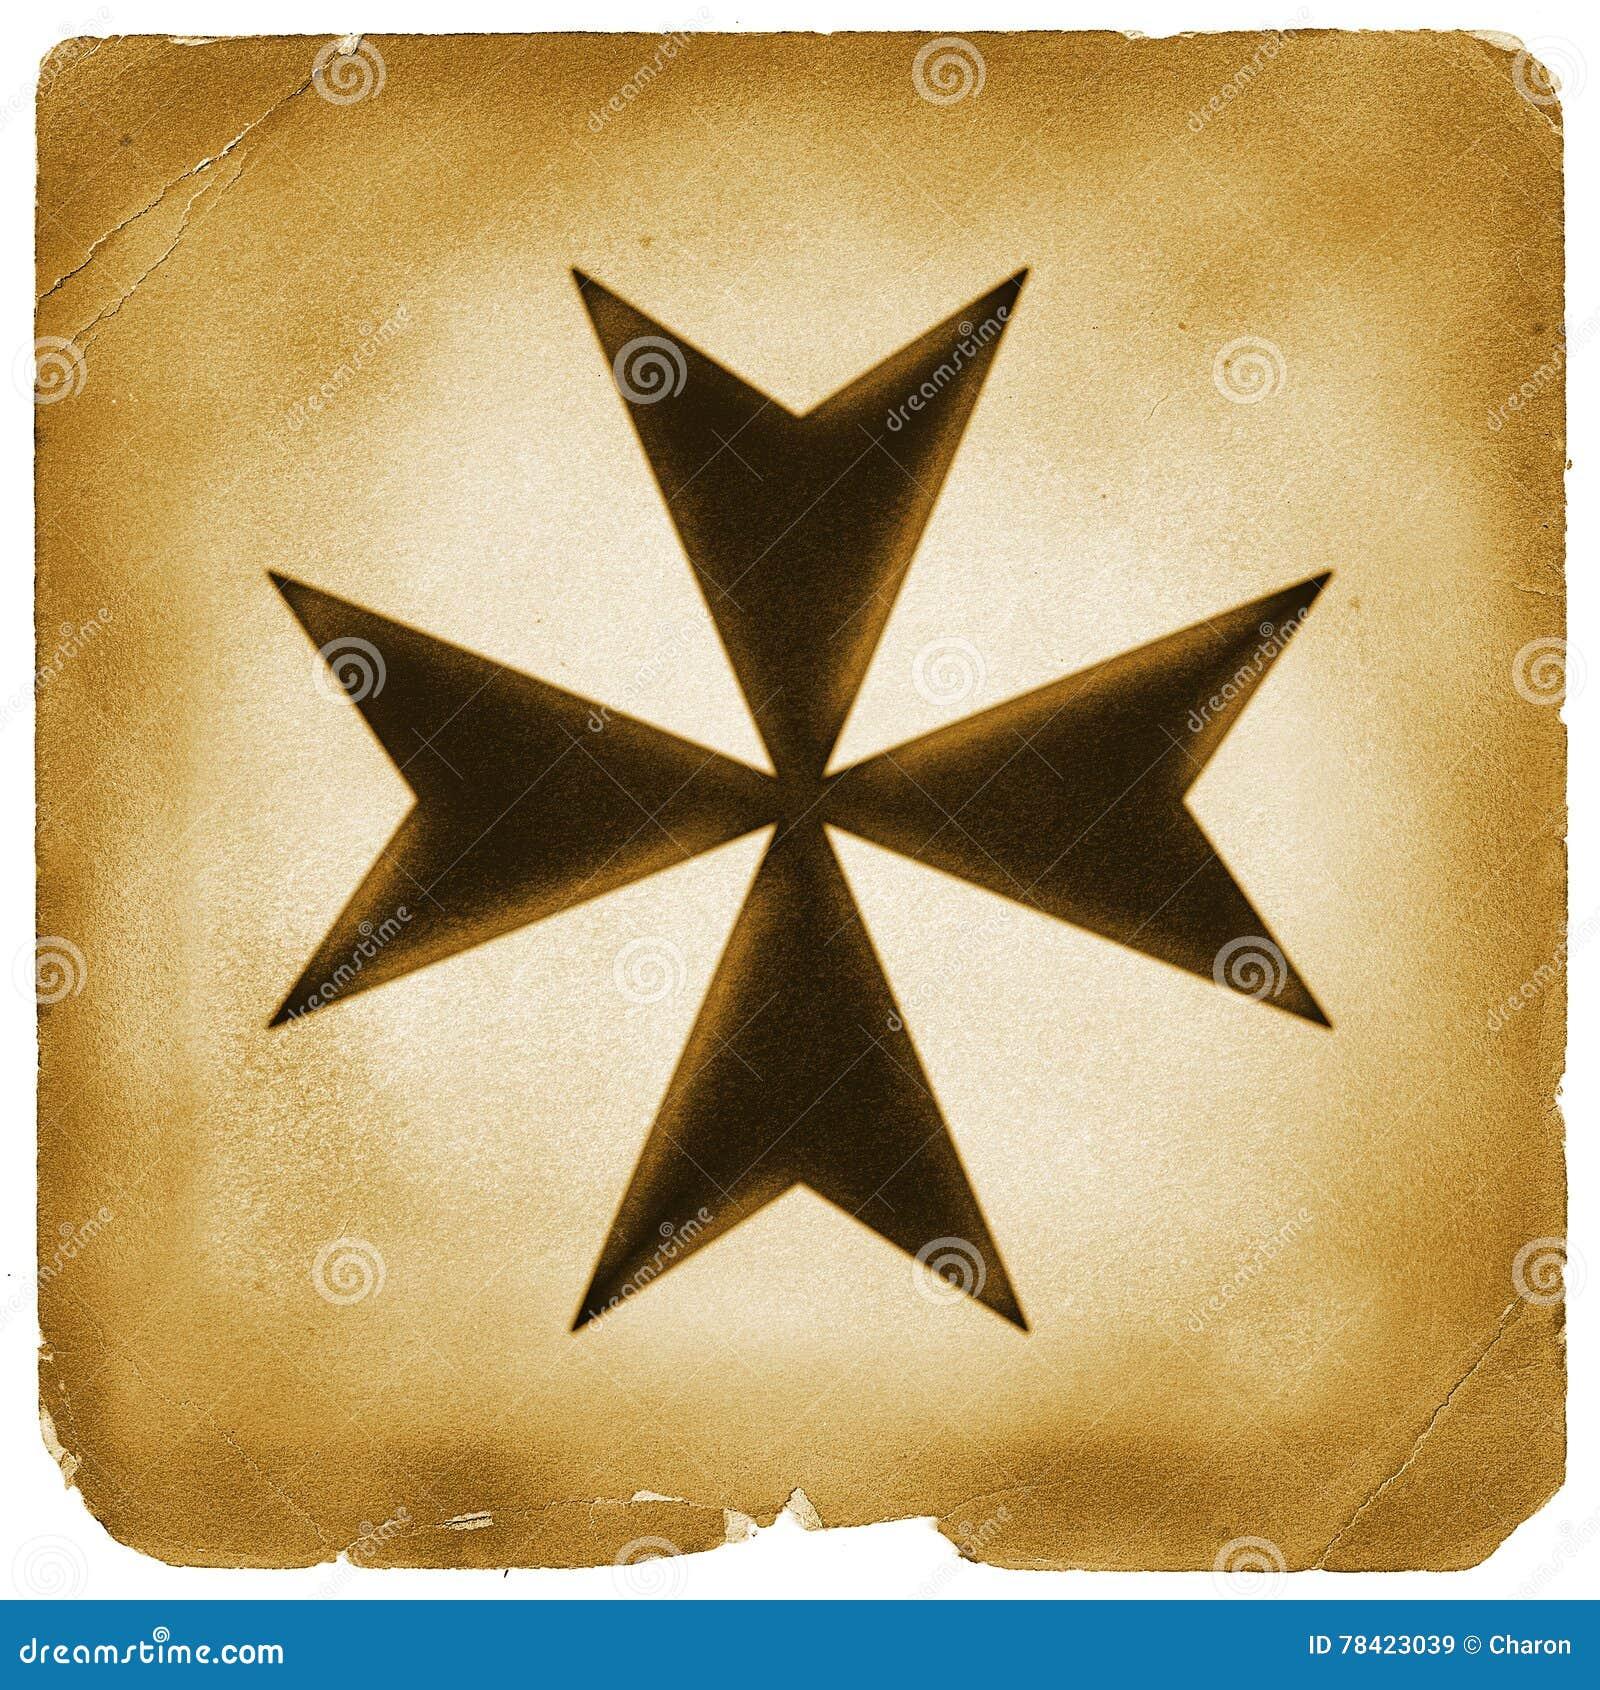 Maltese cross symbol on old paper stock illustration image 78423039 maltese cross symbol on old paper biocorpaavc